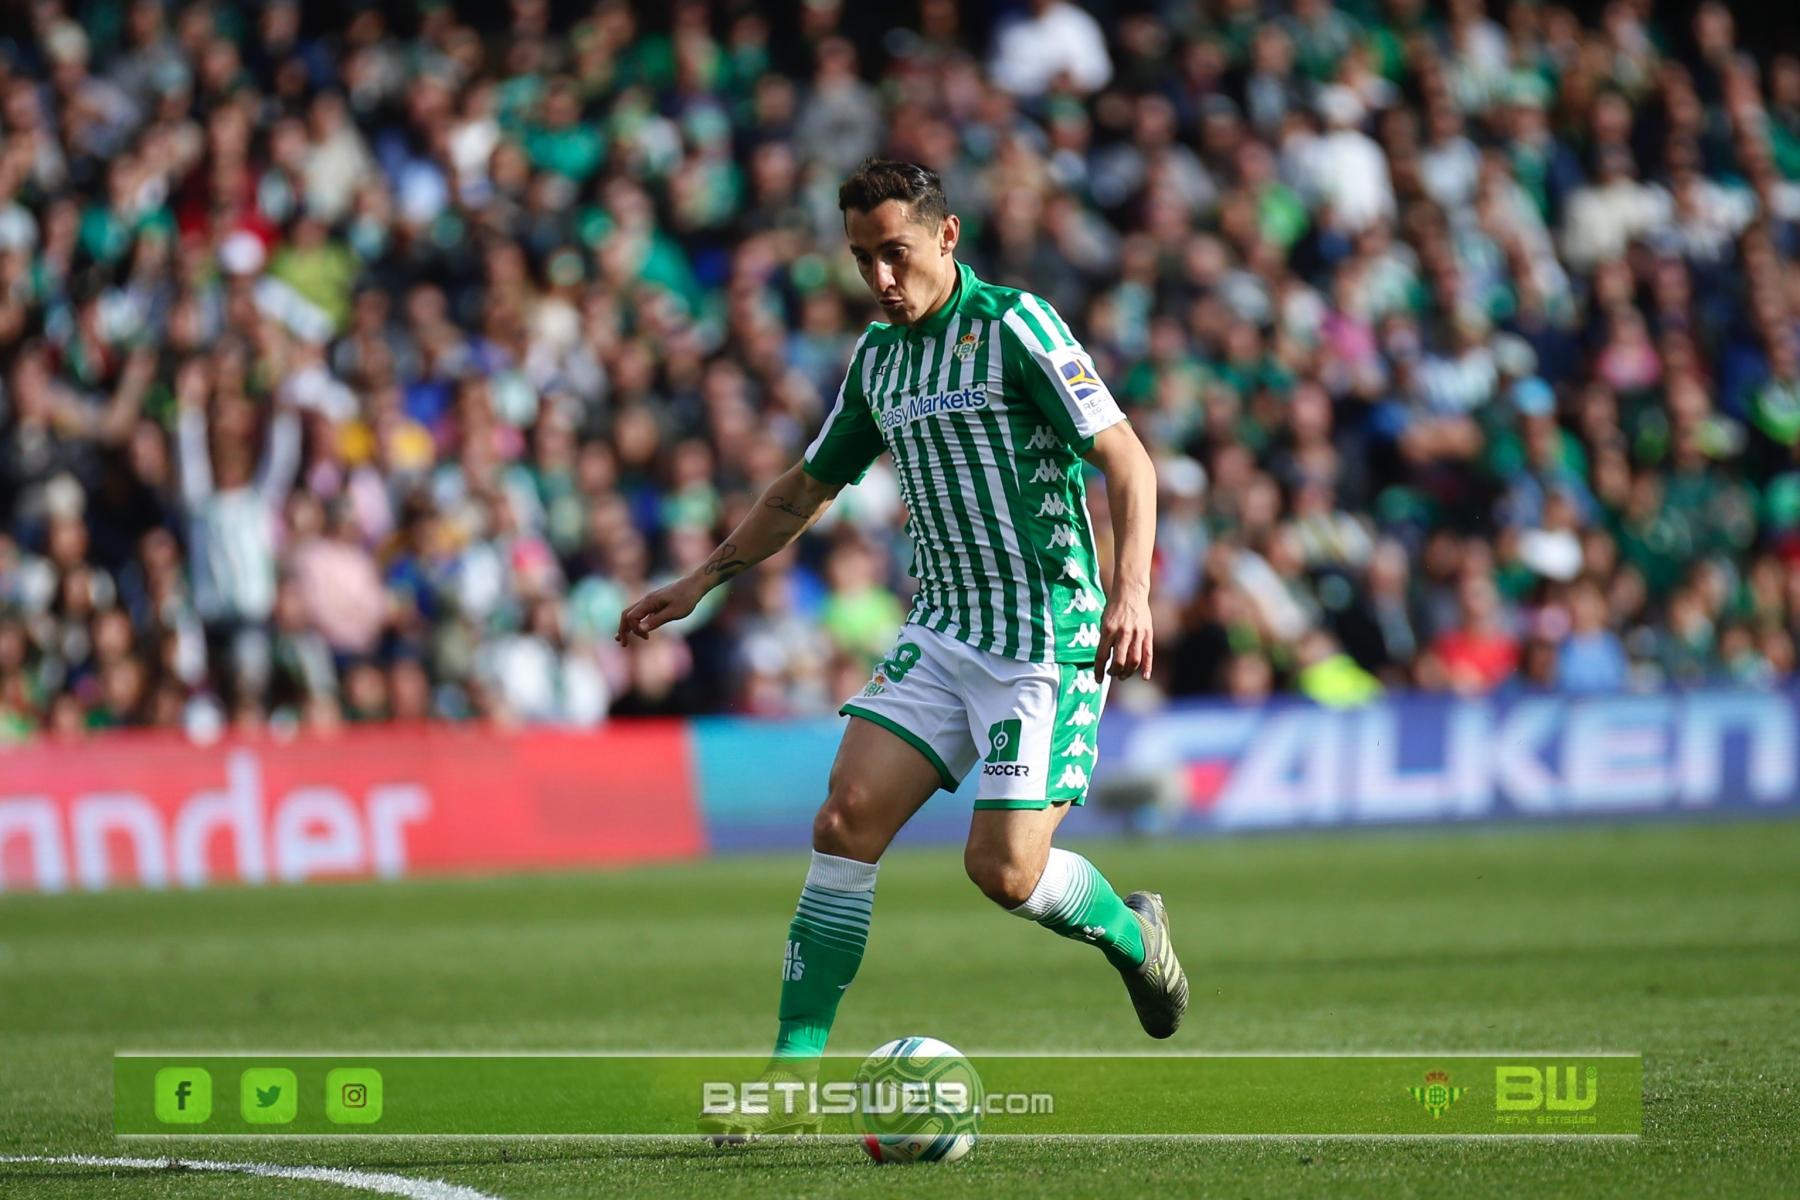 J20 Real Betis - Real Sociedad 37